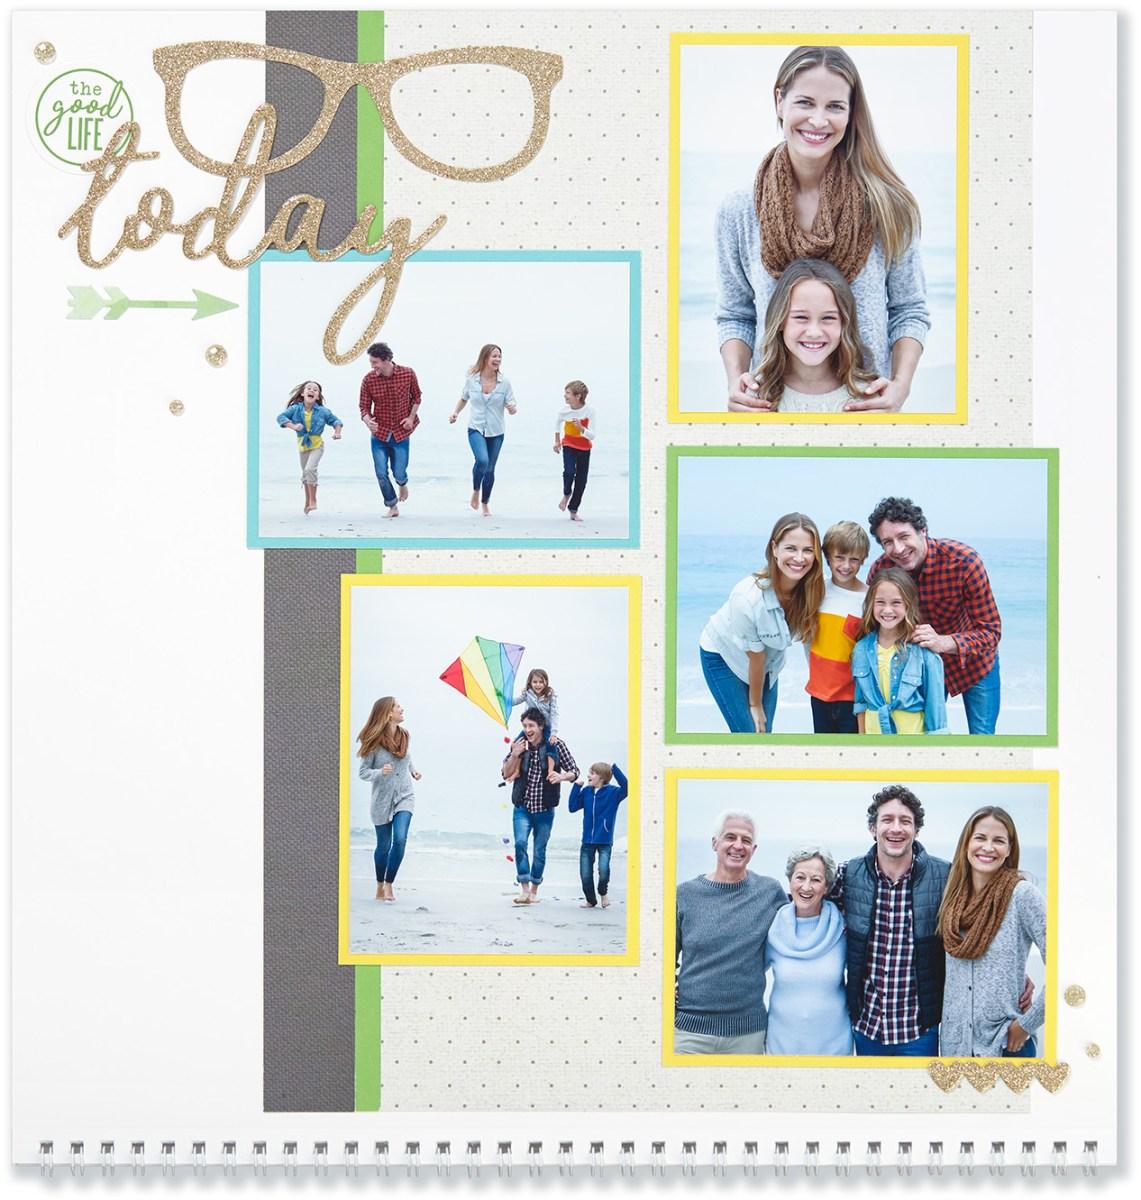 Through the Year #ctmh #closetomyheart #throughtheyear #calendar #kit #scrapbooking #scrapbook #memorykeeping #keepsake #gift #diy #family #Chrismas #present #photos #gold #glitter #diecut #gems #hearts #glasses #goodlife